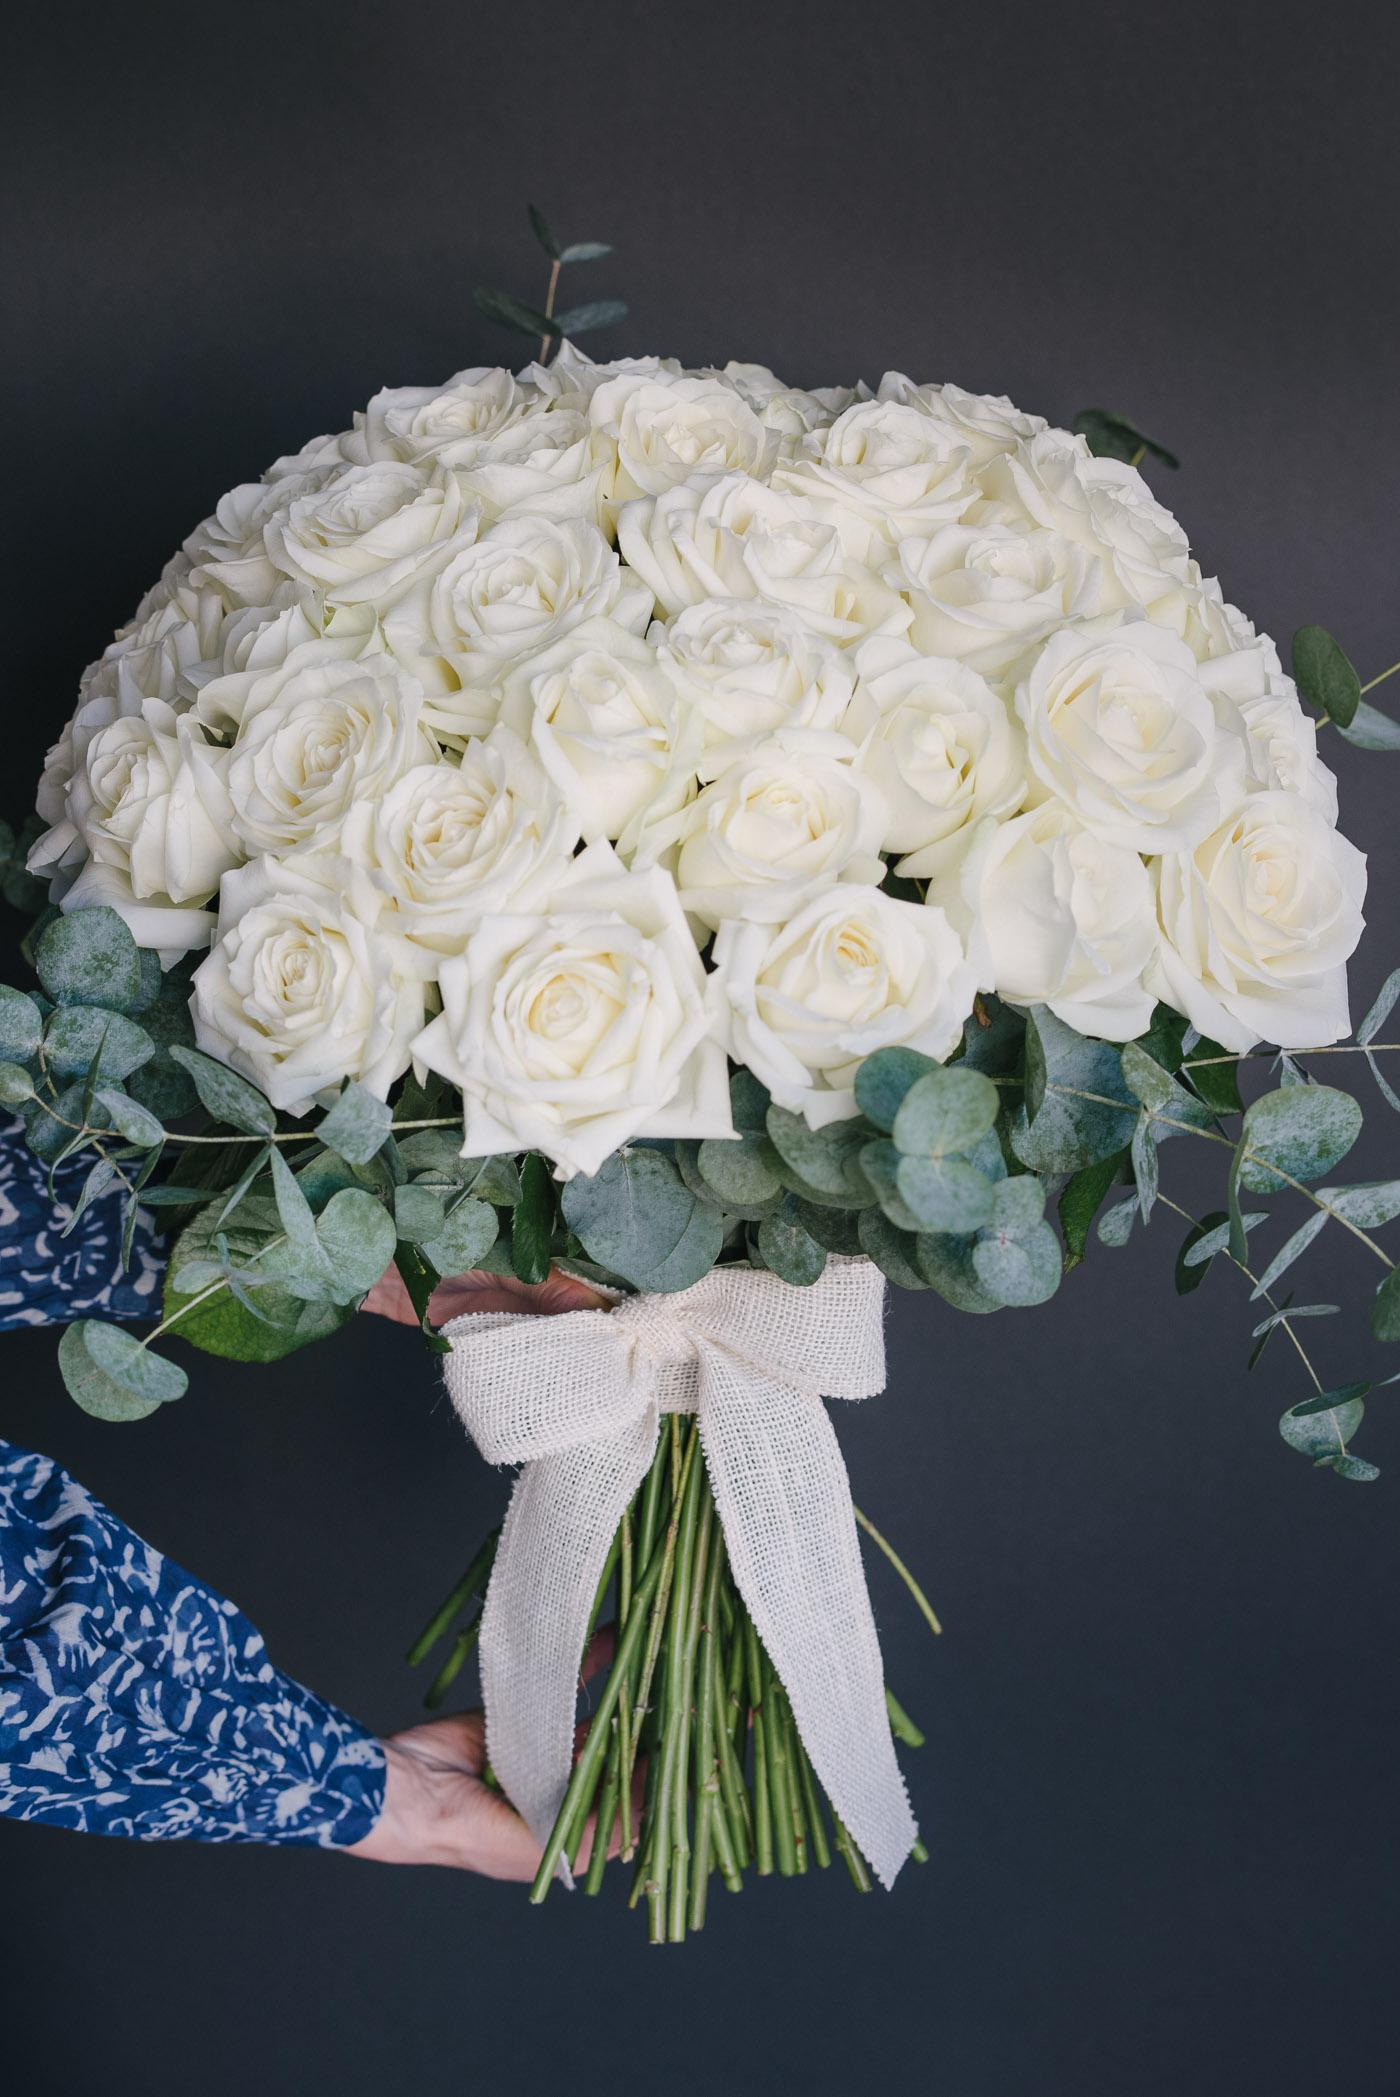 Superflori - Florarie Online